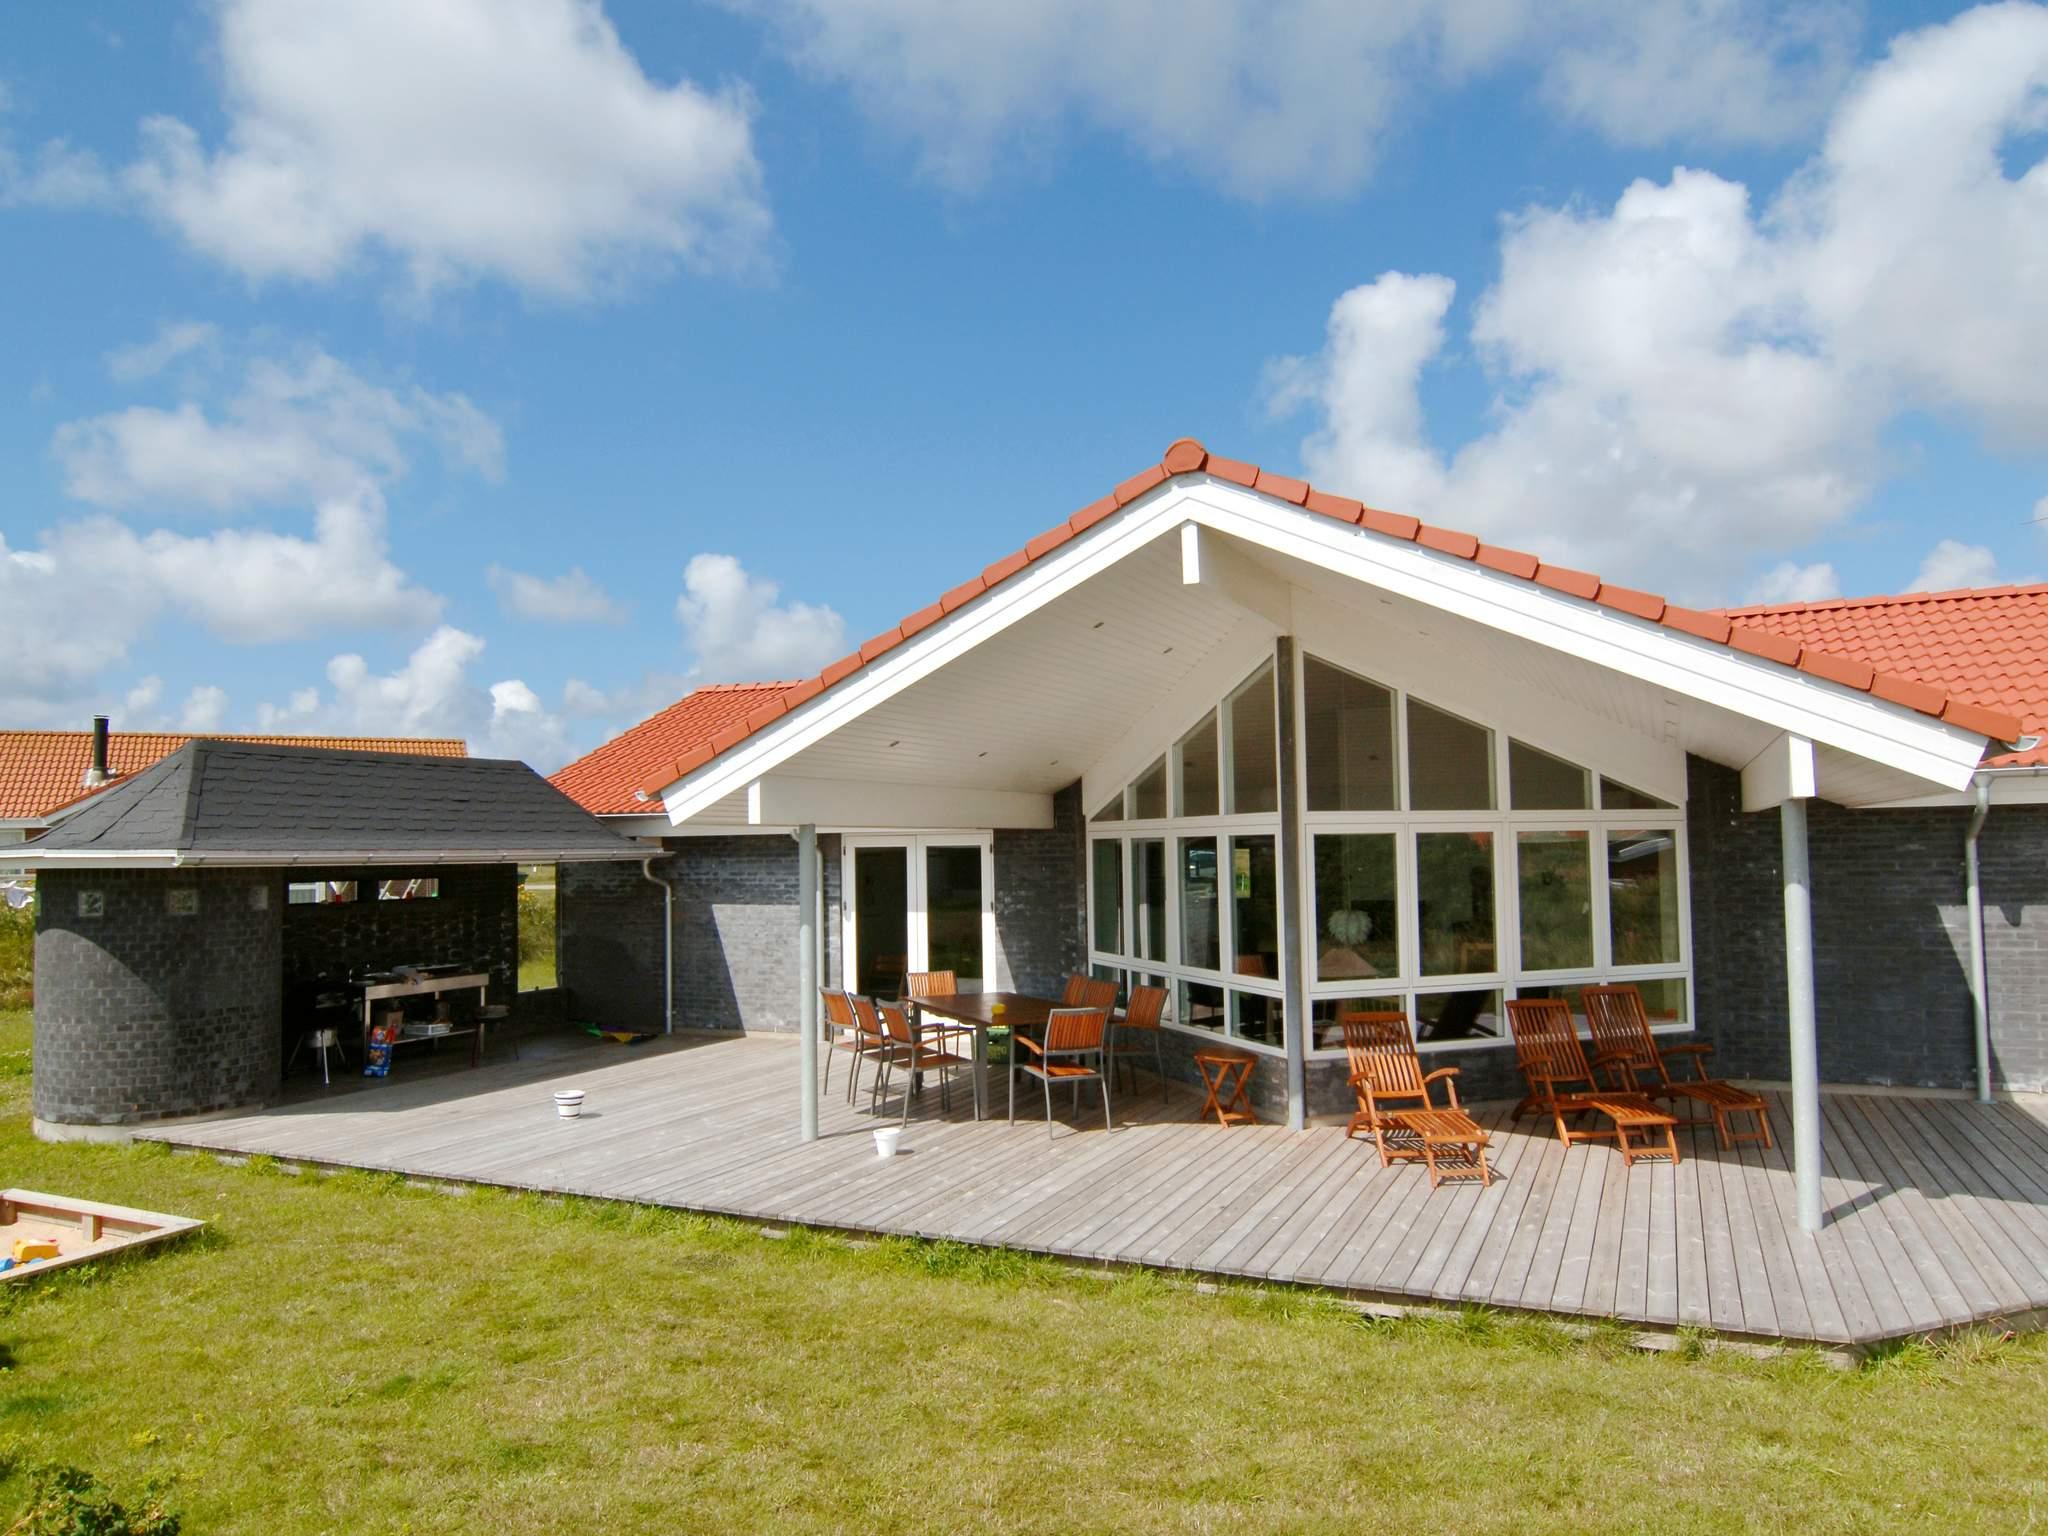 Ferienhaus Haurvig (125276), Hvide Sande, , Westjütland, Dänemark, Bild 23